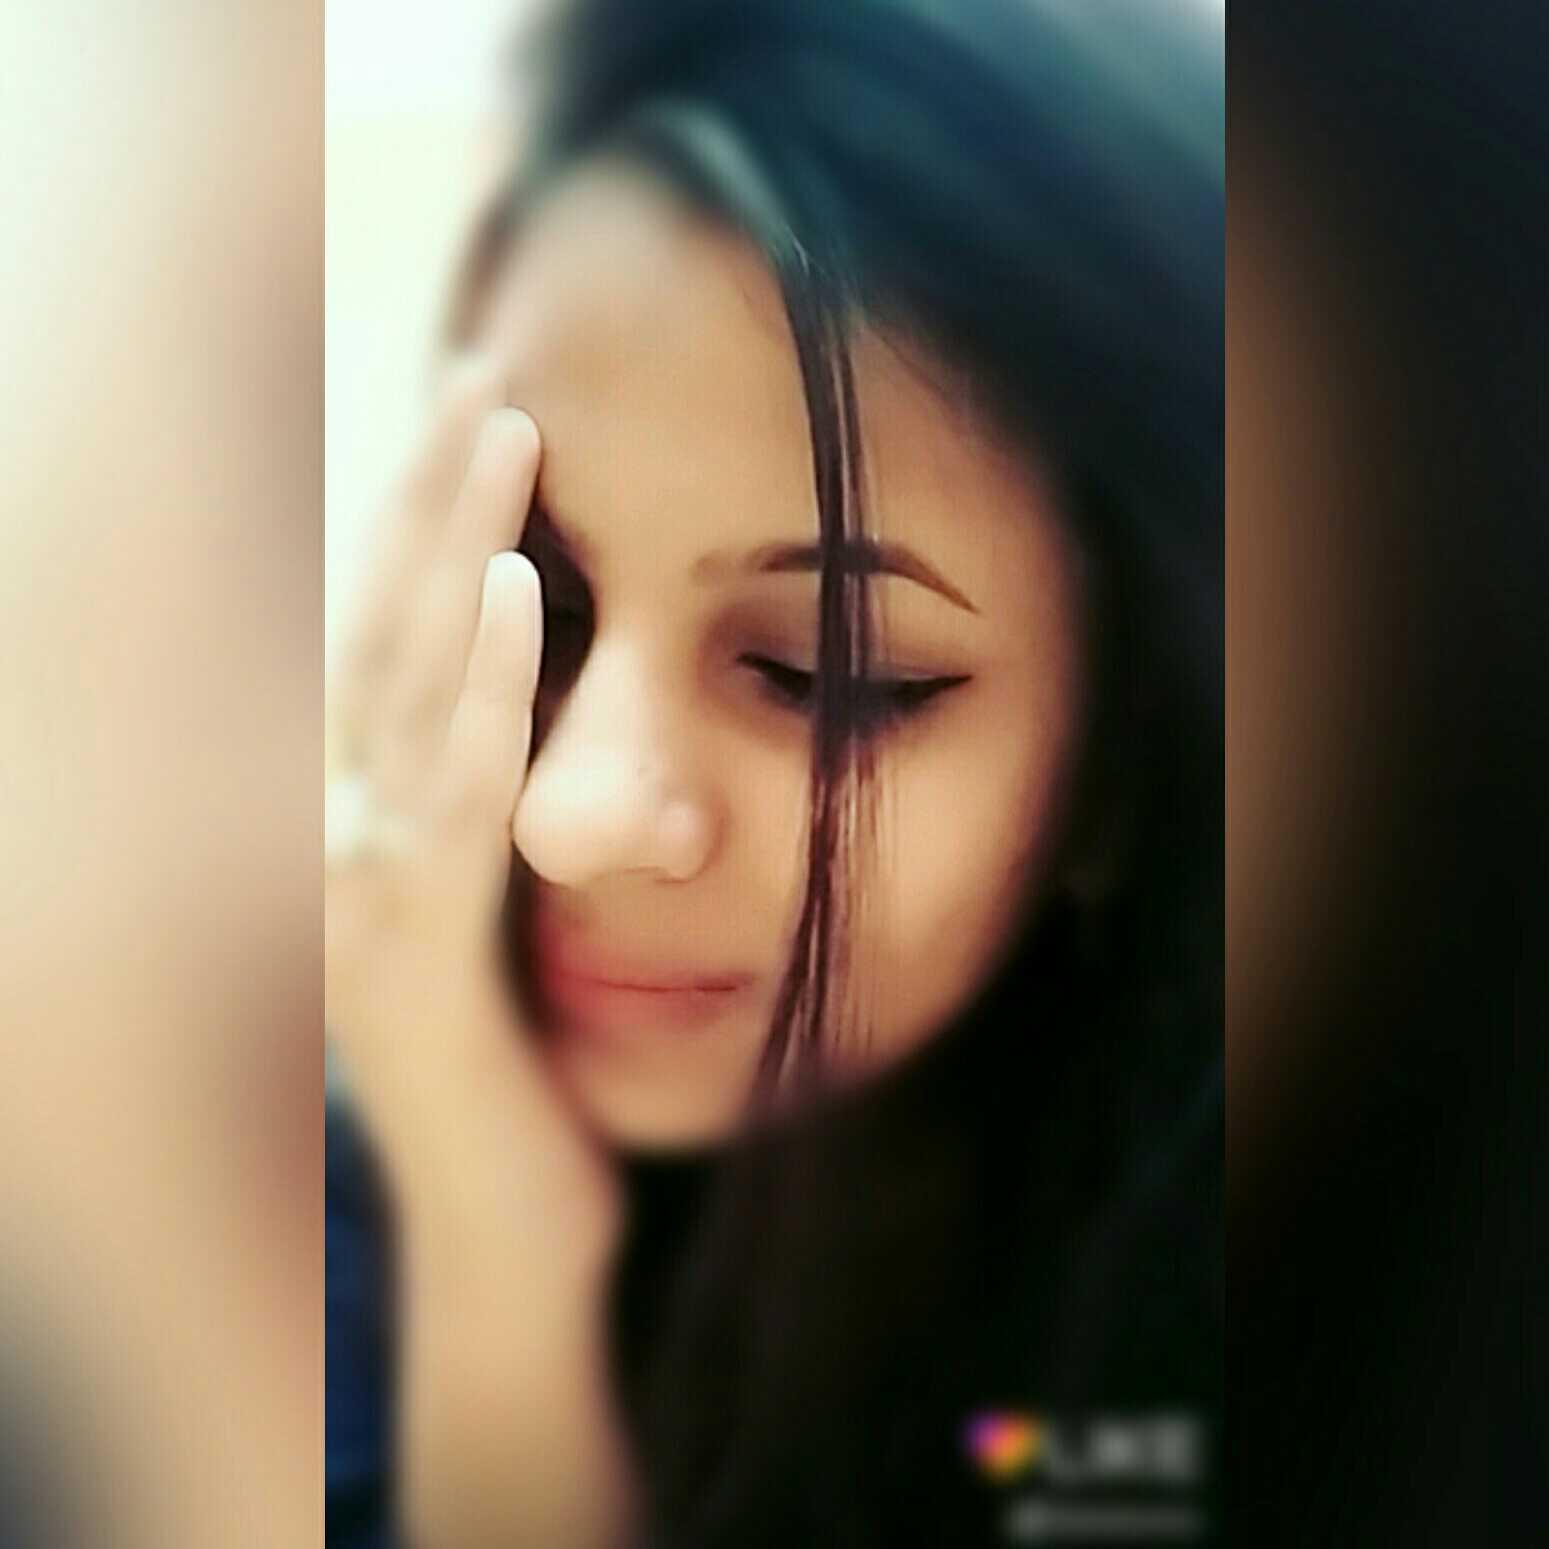 Shaayra